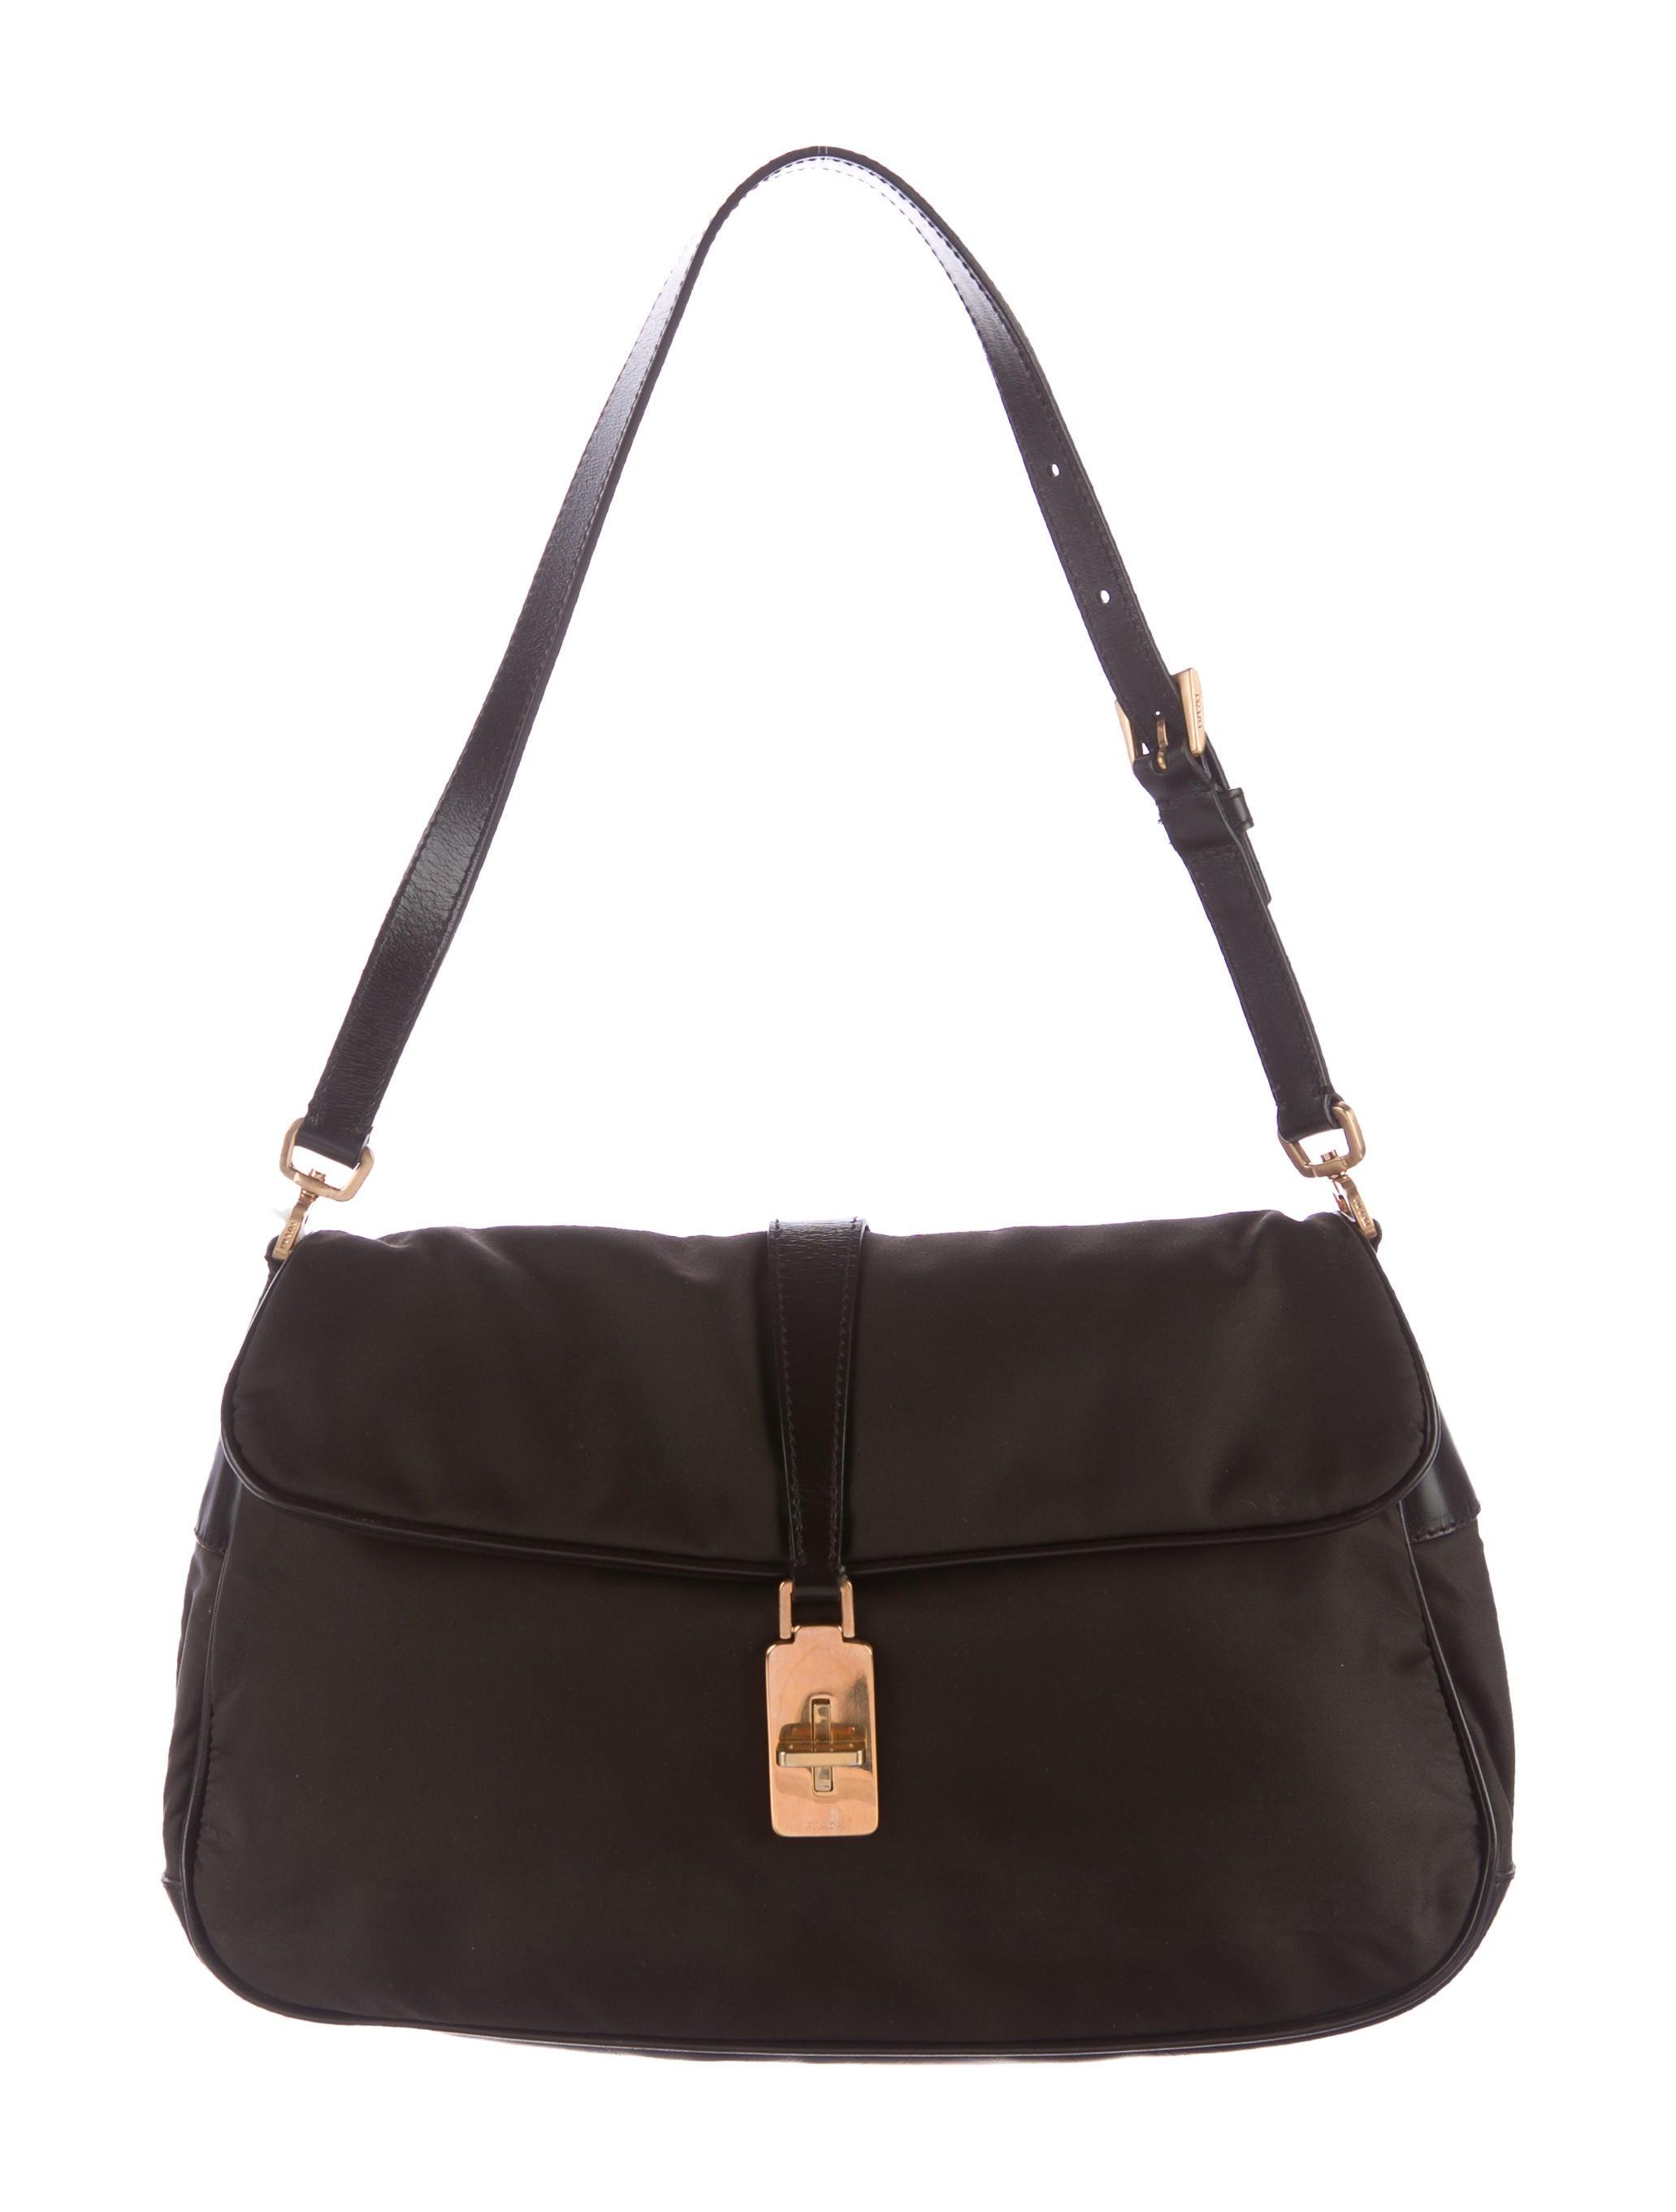 098ee96ab63 Prada Tessuto Flap Shoulder Bag - Handbags - PRA156786 | The RealReal